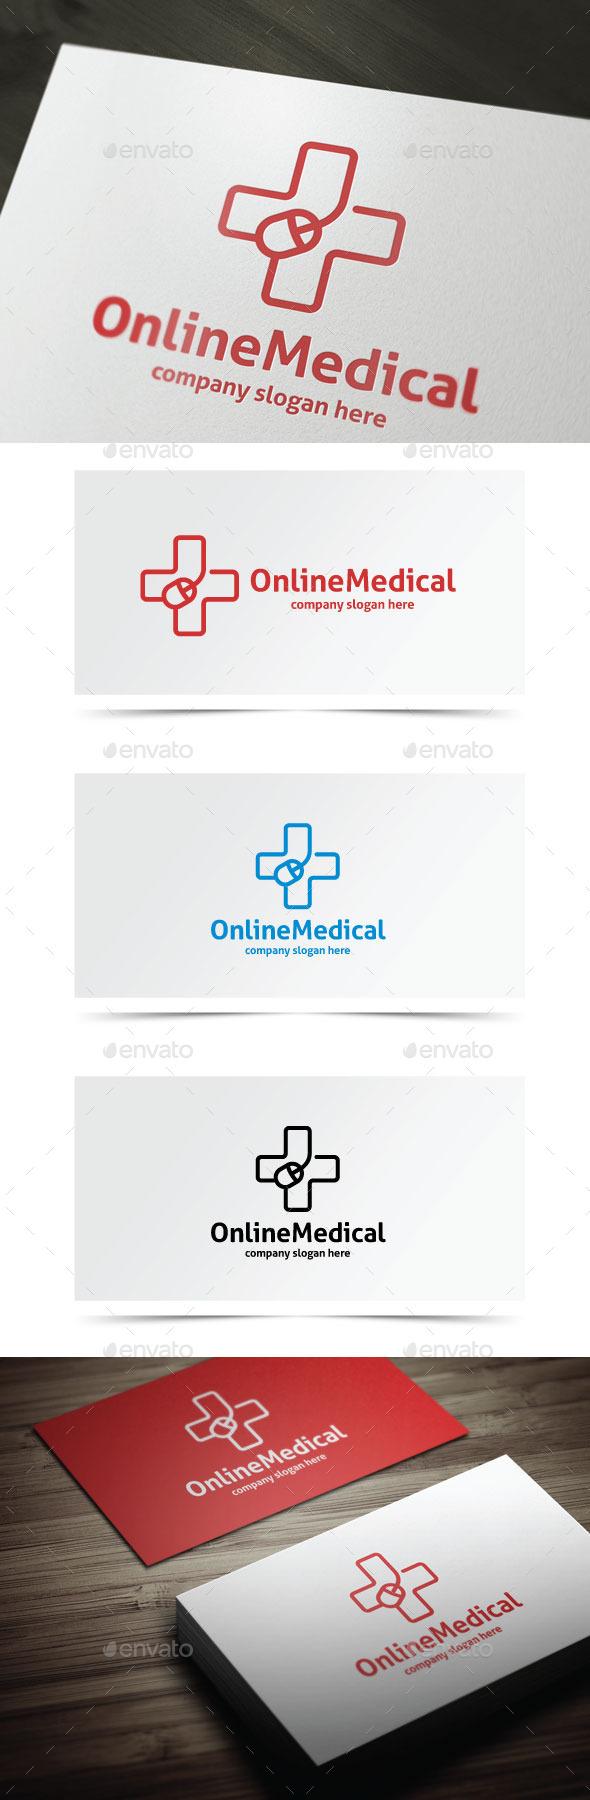 GraphicRiver Online Medical 10638048